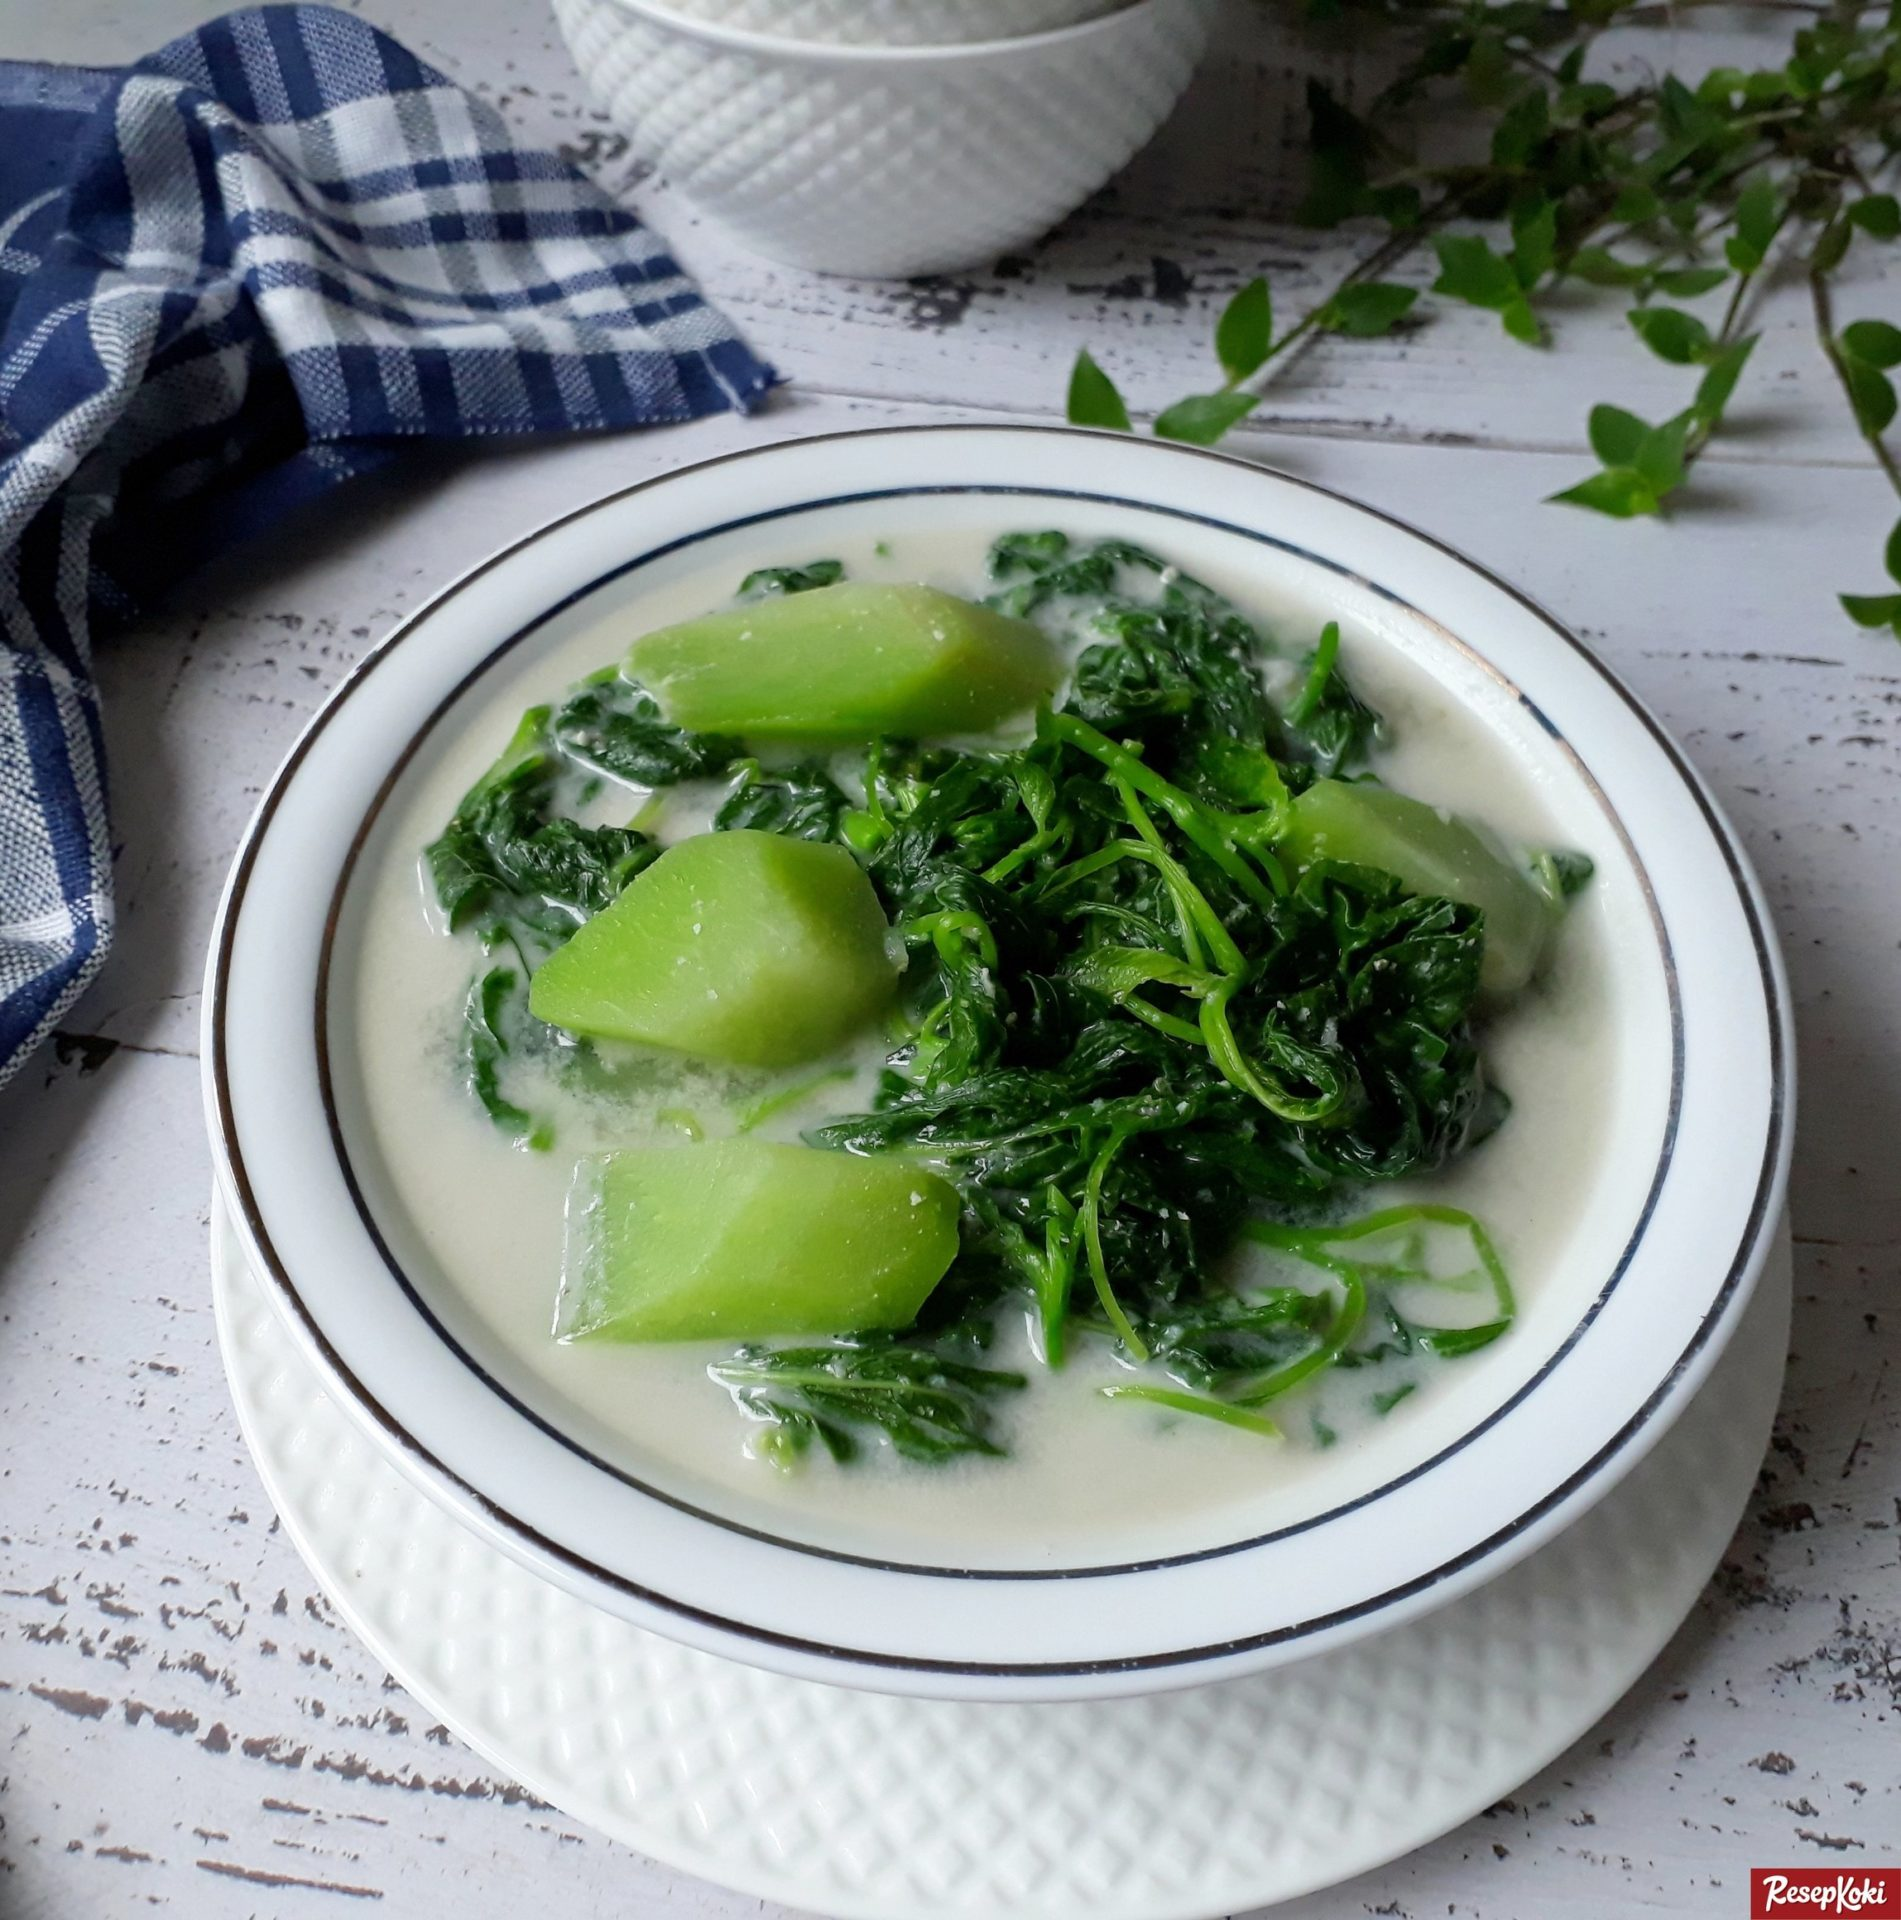 Sayur Bobor Bayam Gurih Lezat Dan Mudah Dibuat Resep Resepkoki